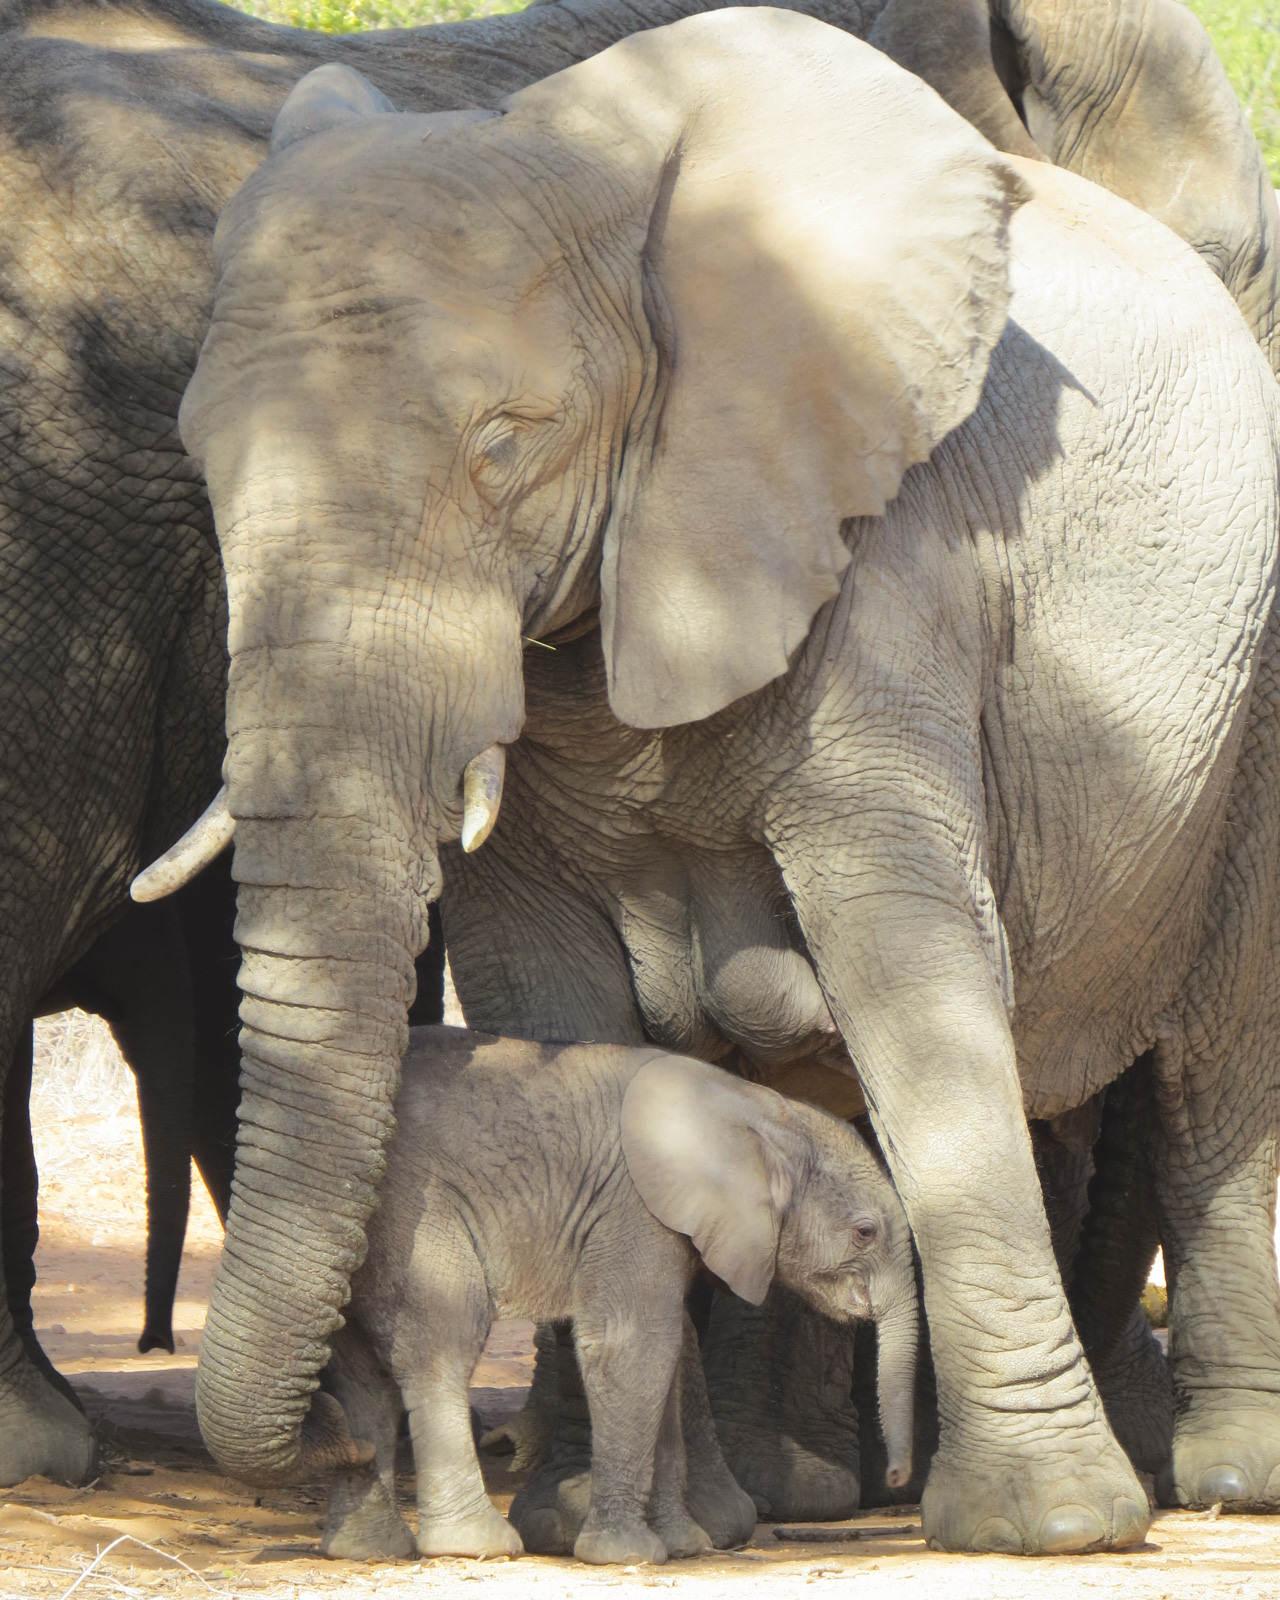 Elephant baby at Kapama Kruger Park